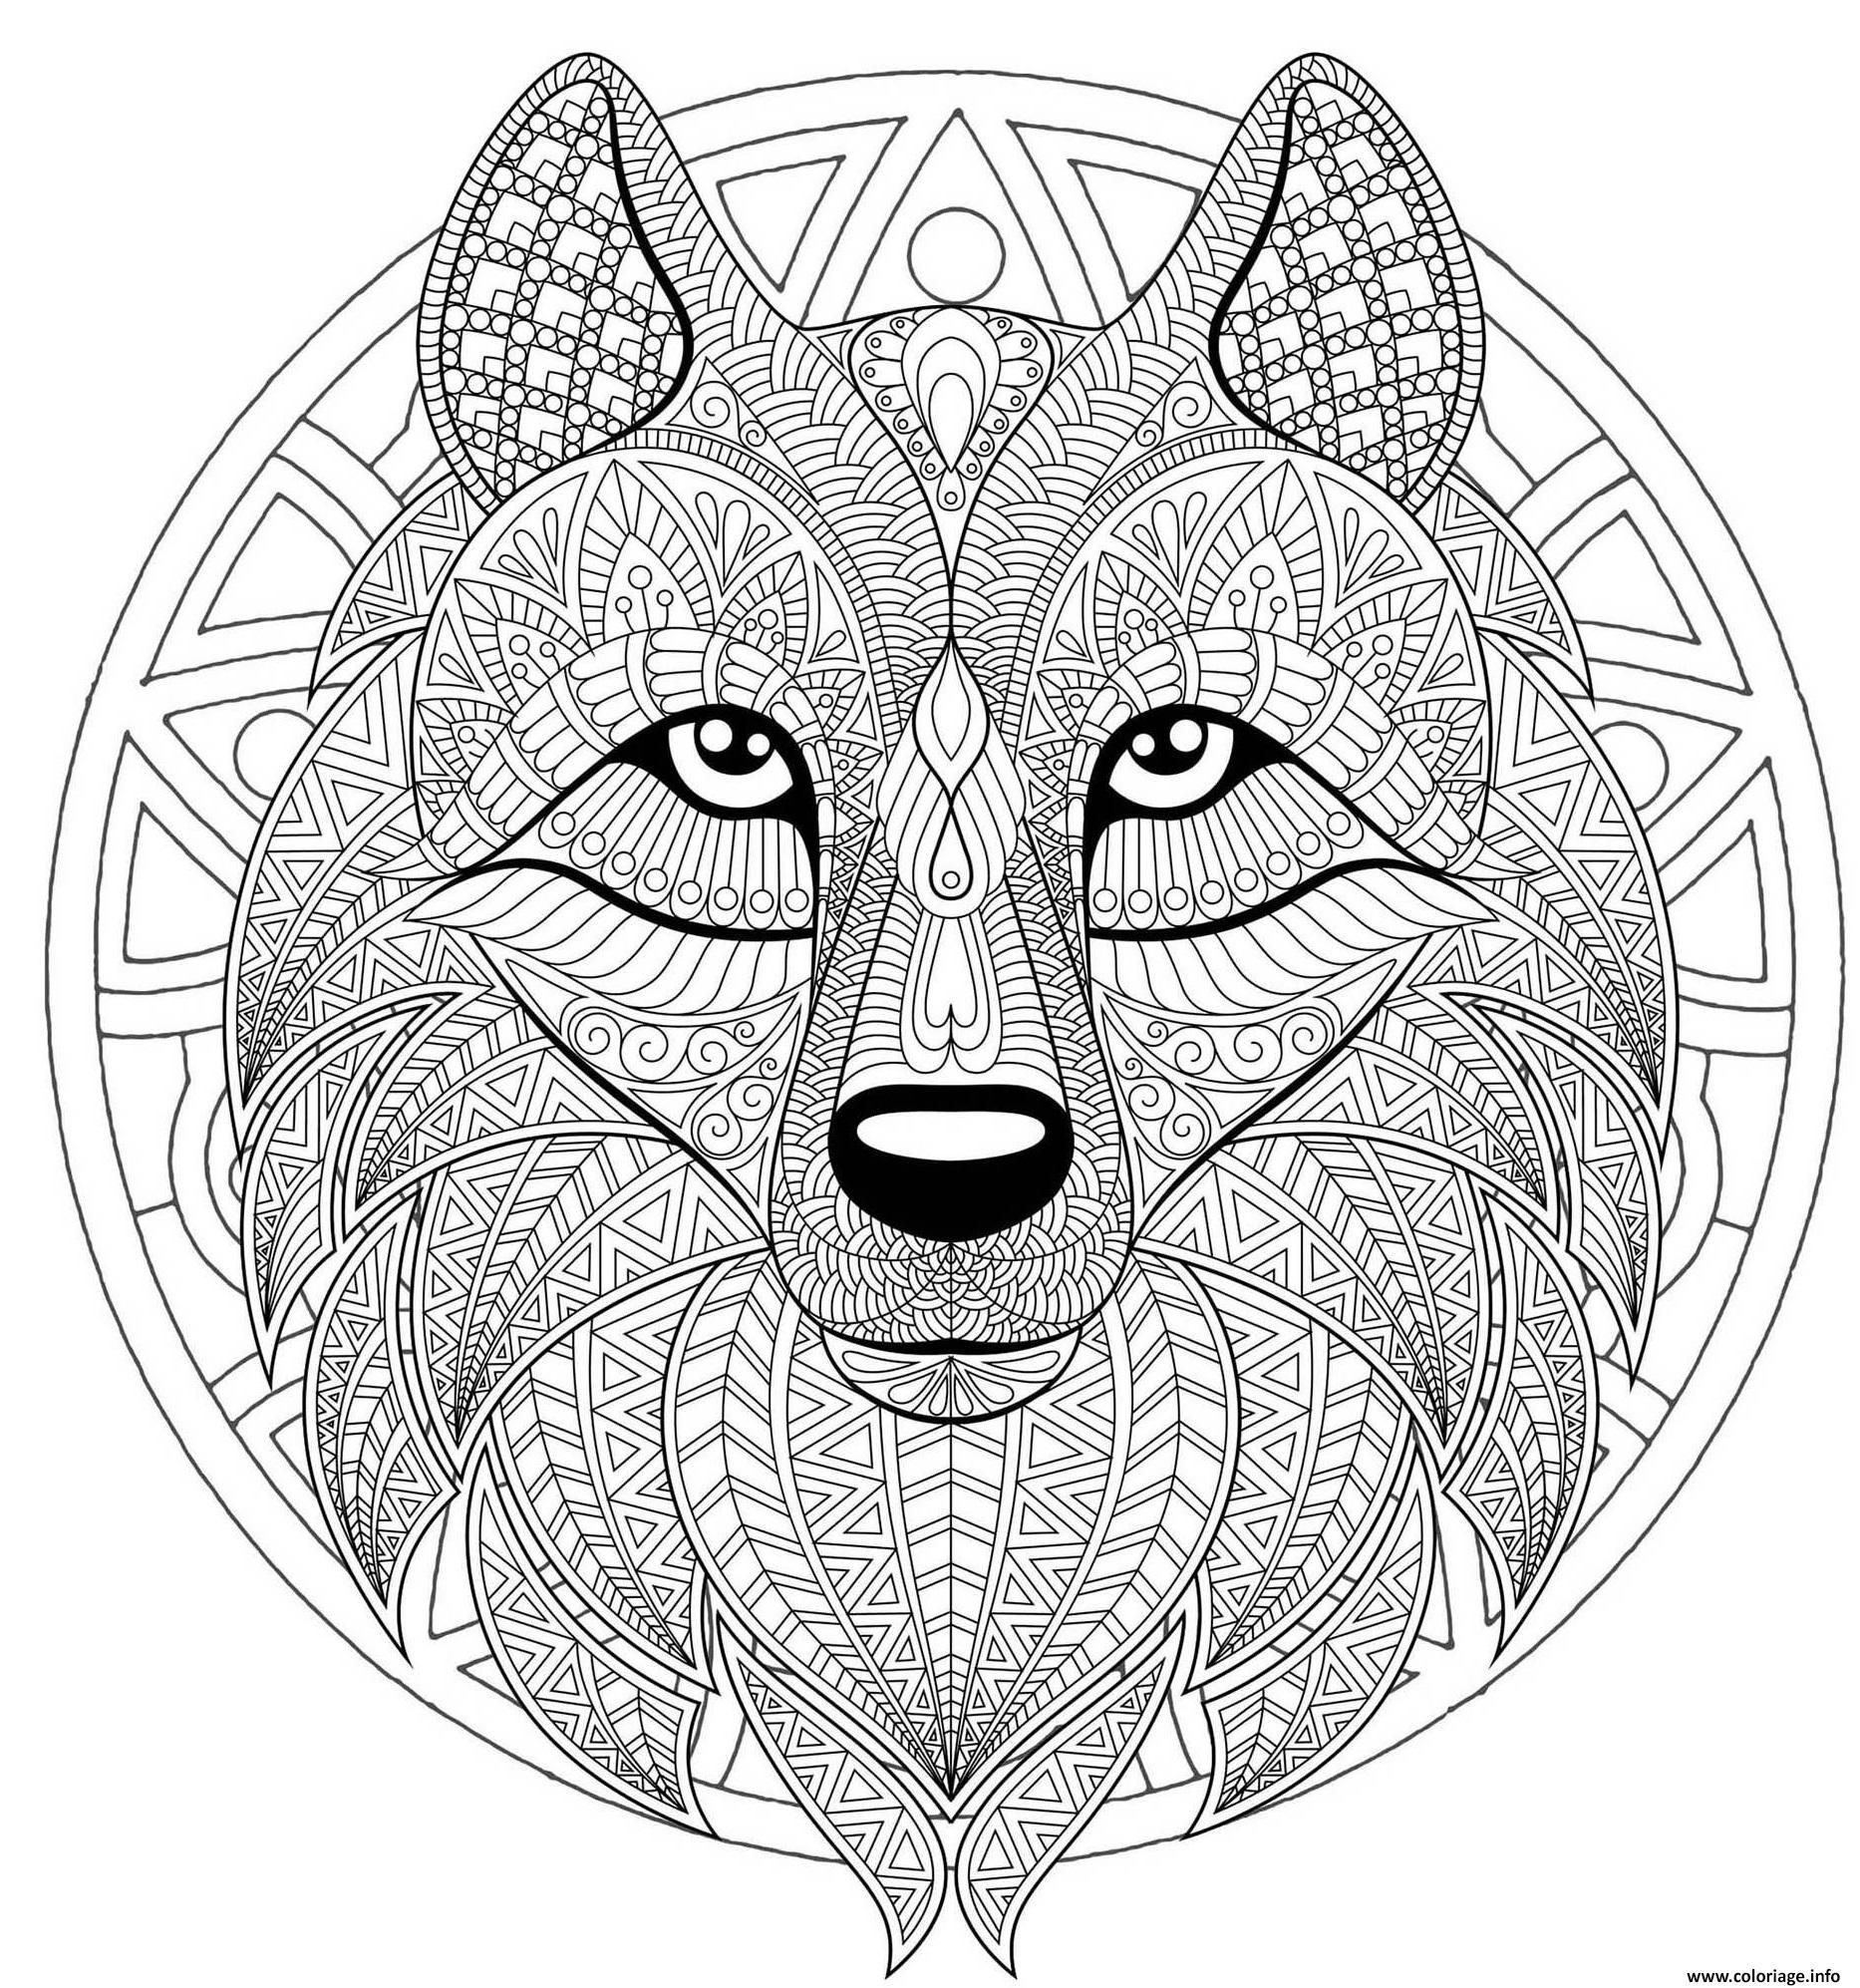 Coloriage Mandala Loup Difficile Complexe Beau Loup Dessin intérieur Coloriage De Mandala Difficile A Imprimer